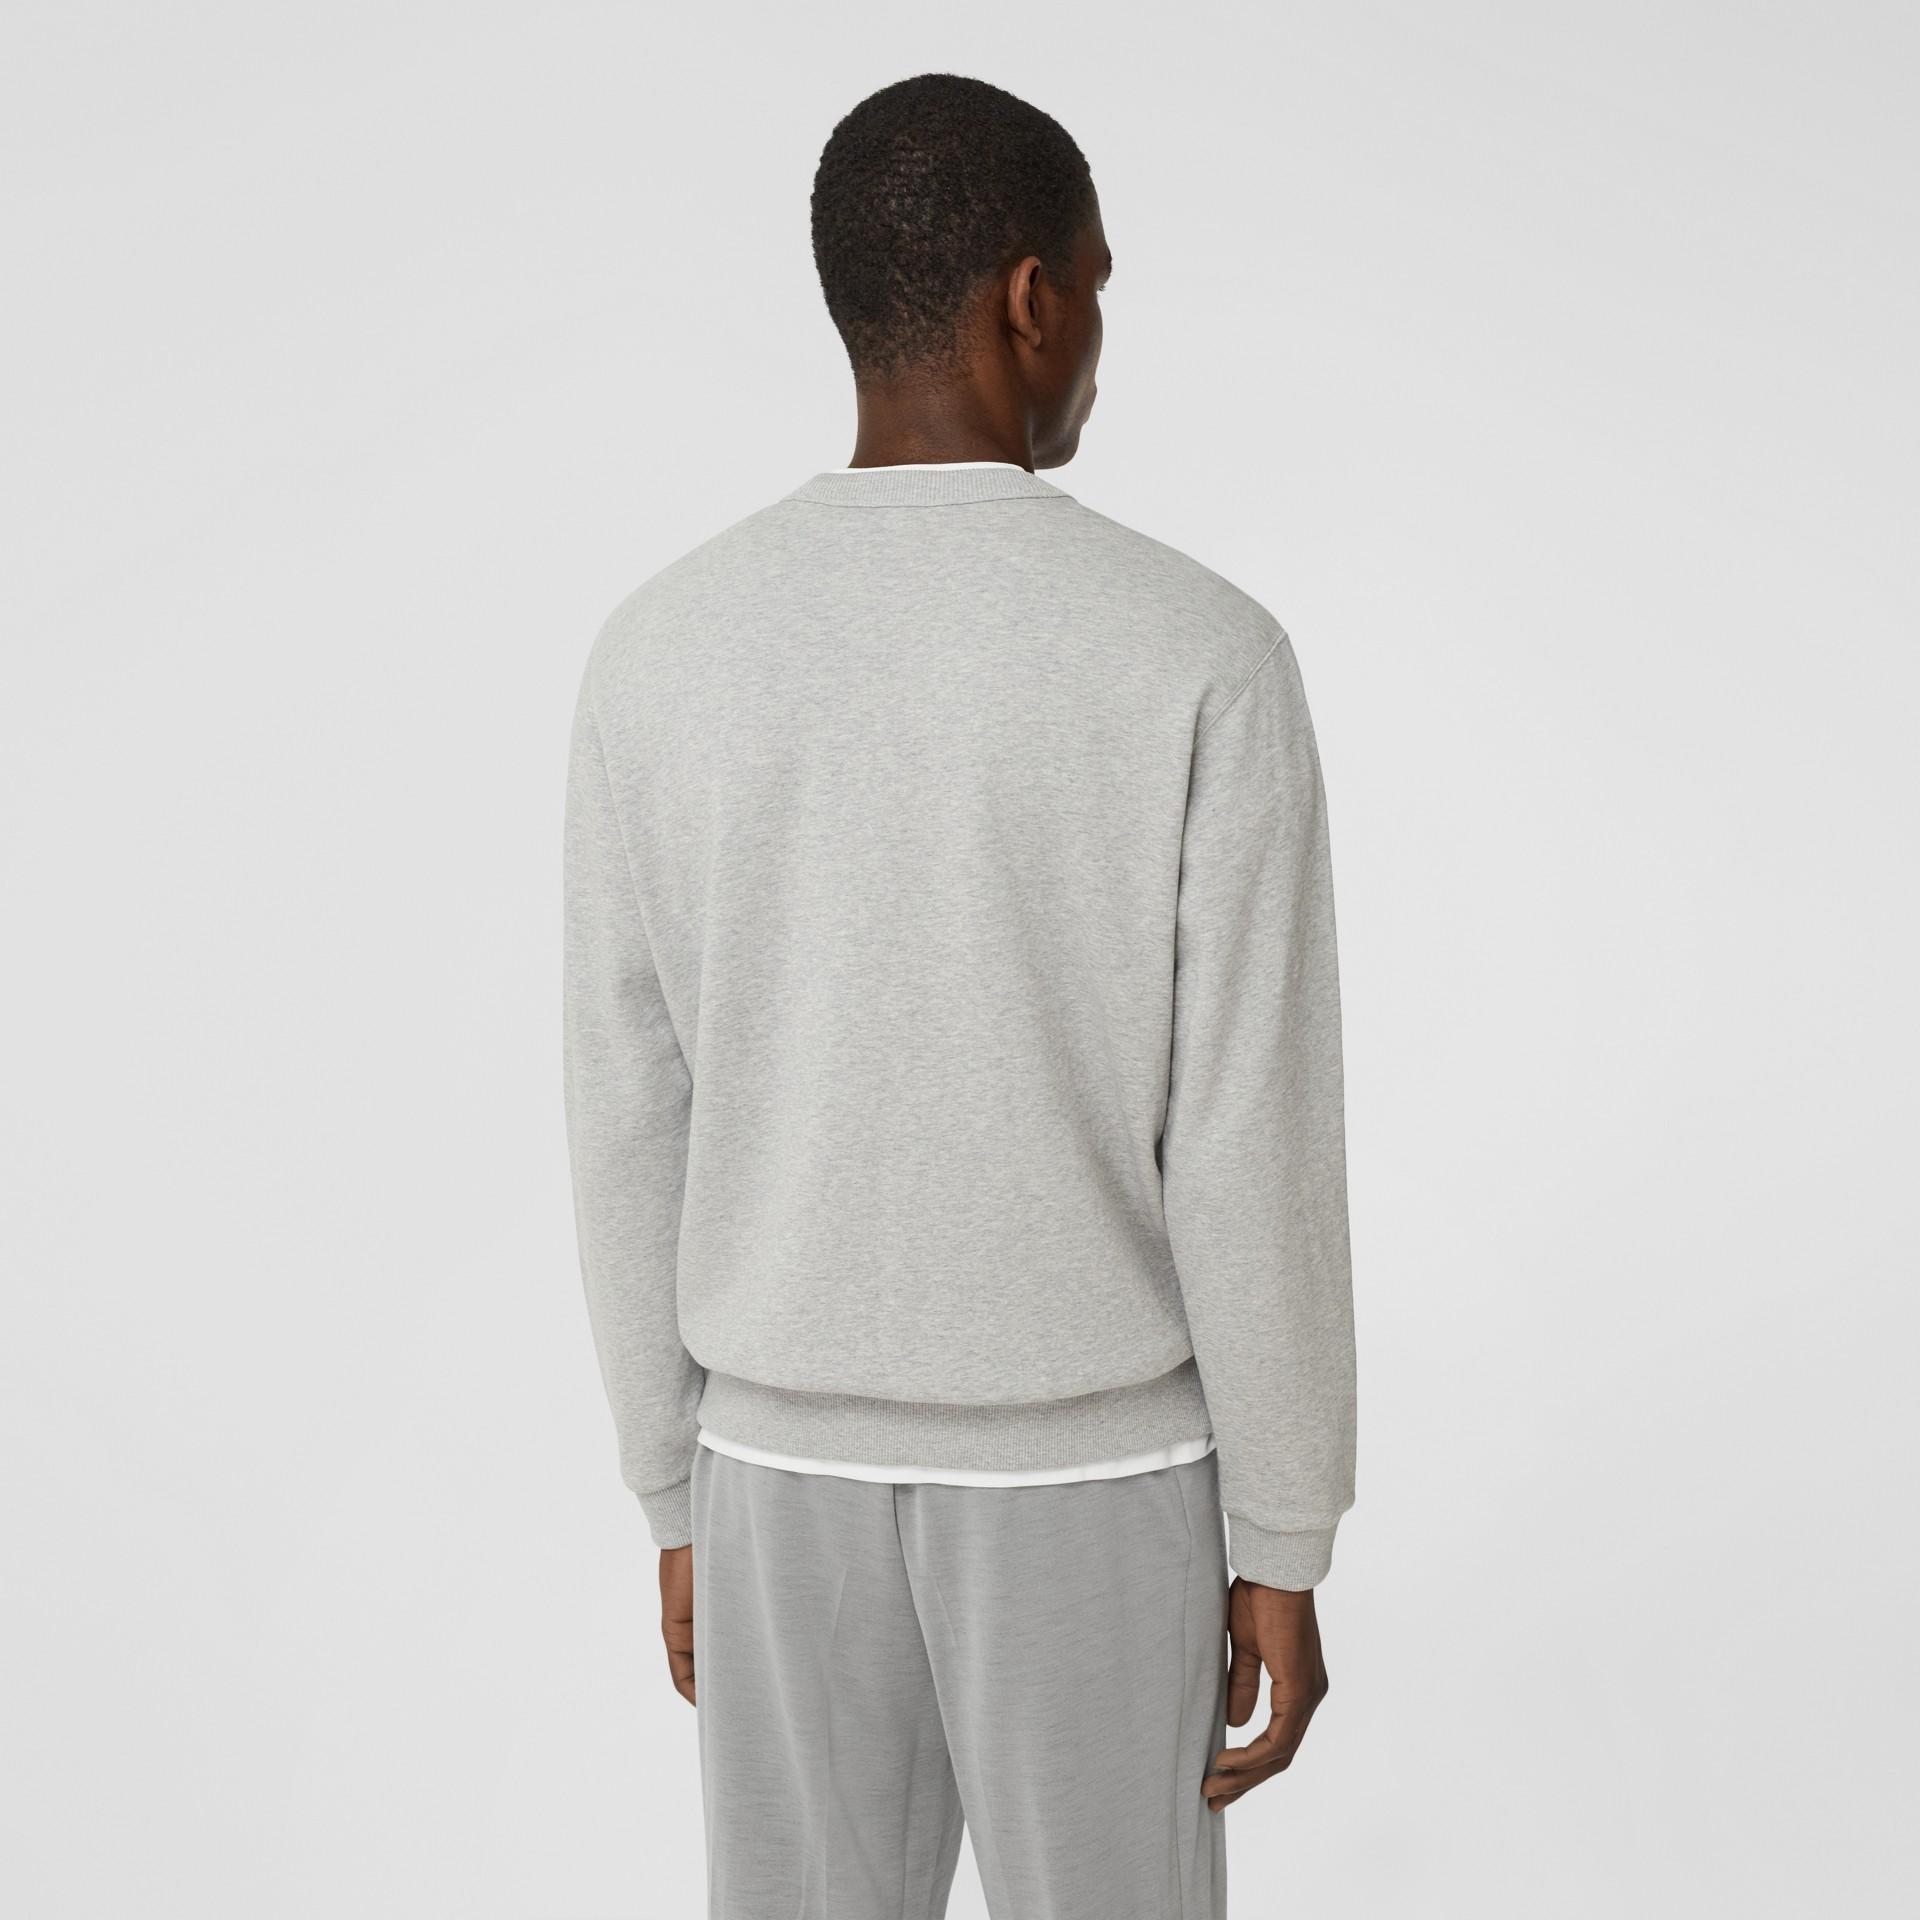 Monogram Motif Cotton Sweatshirt in Pale Grey Melange - Men | Burberry United Kingdom - gallery image 2